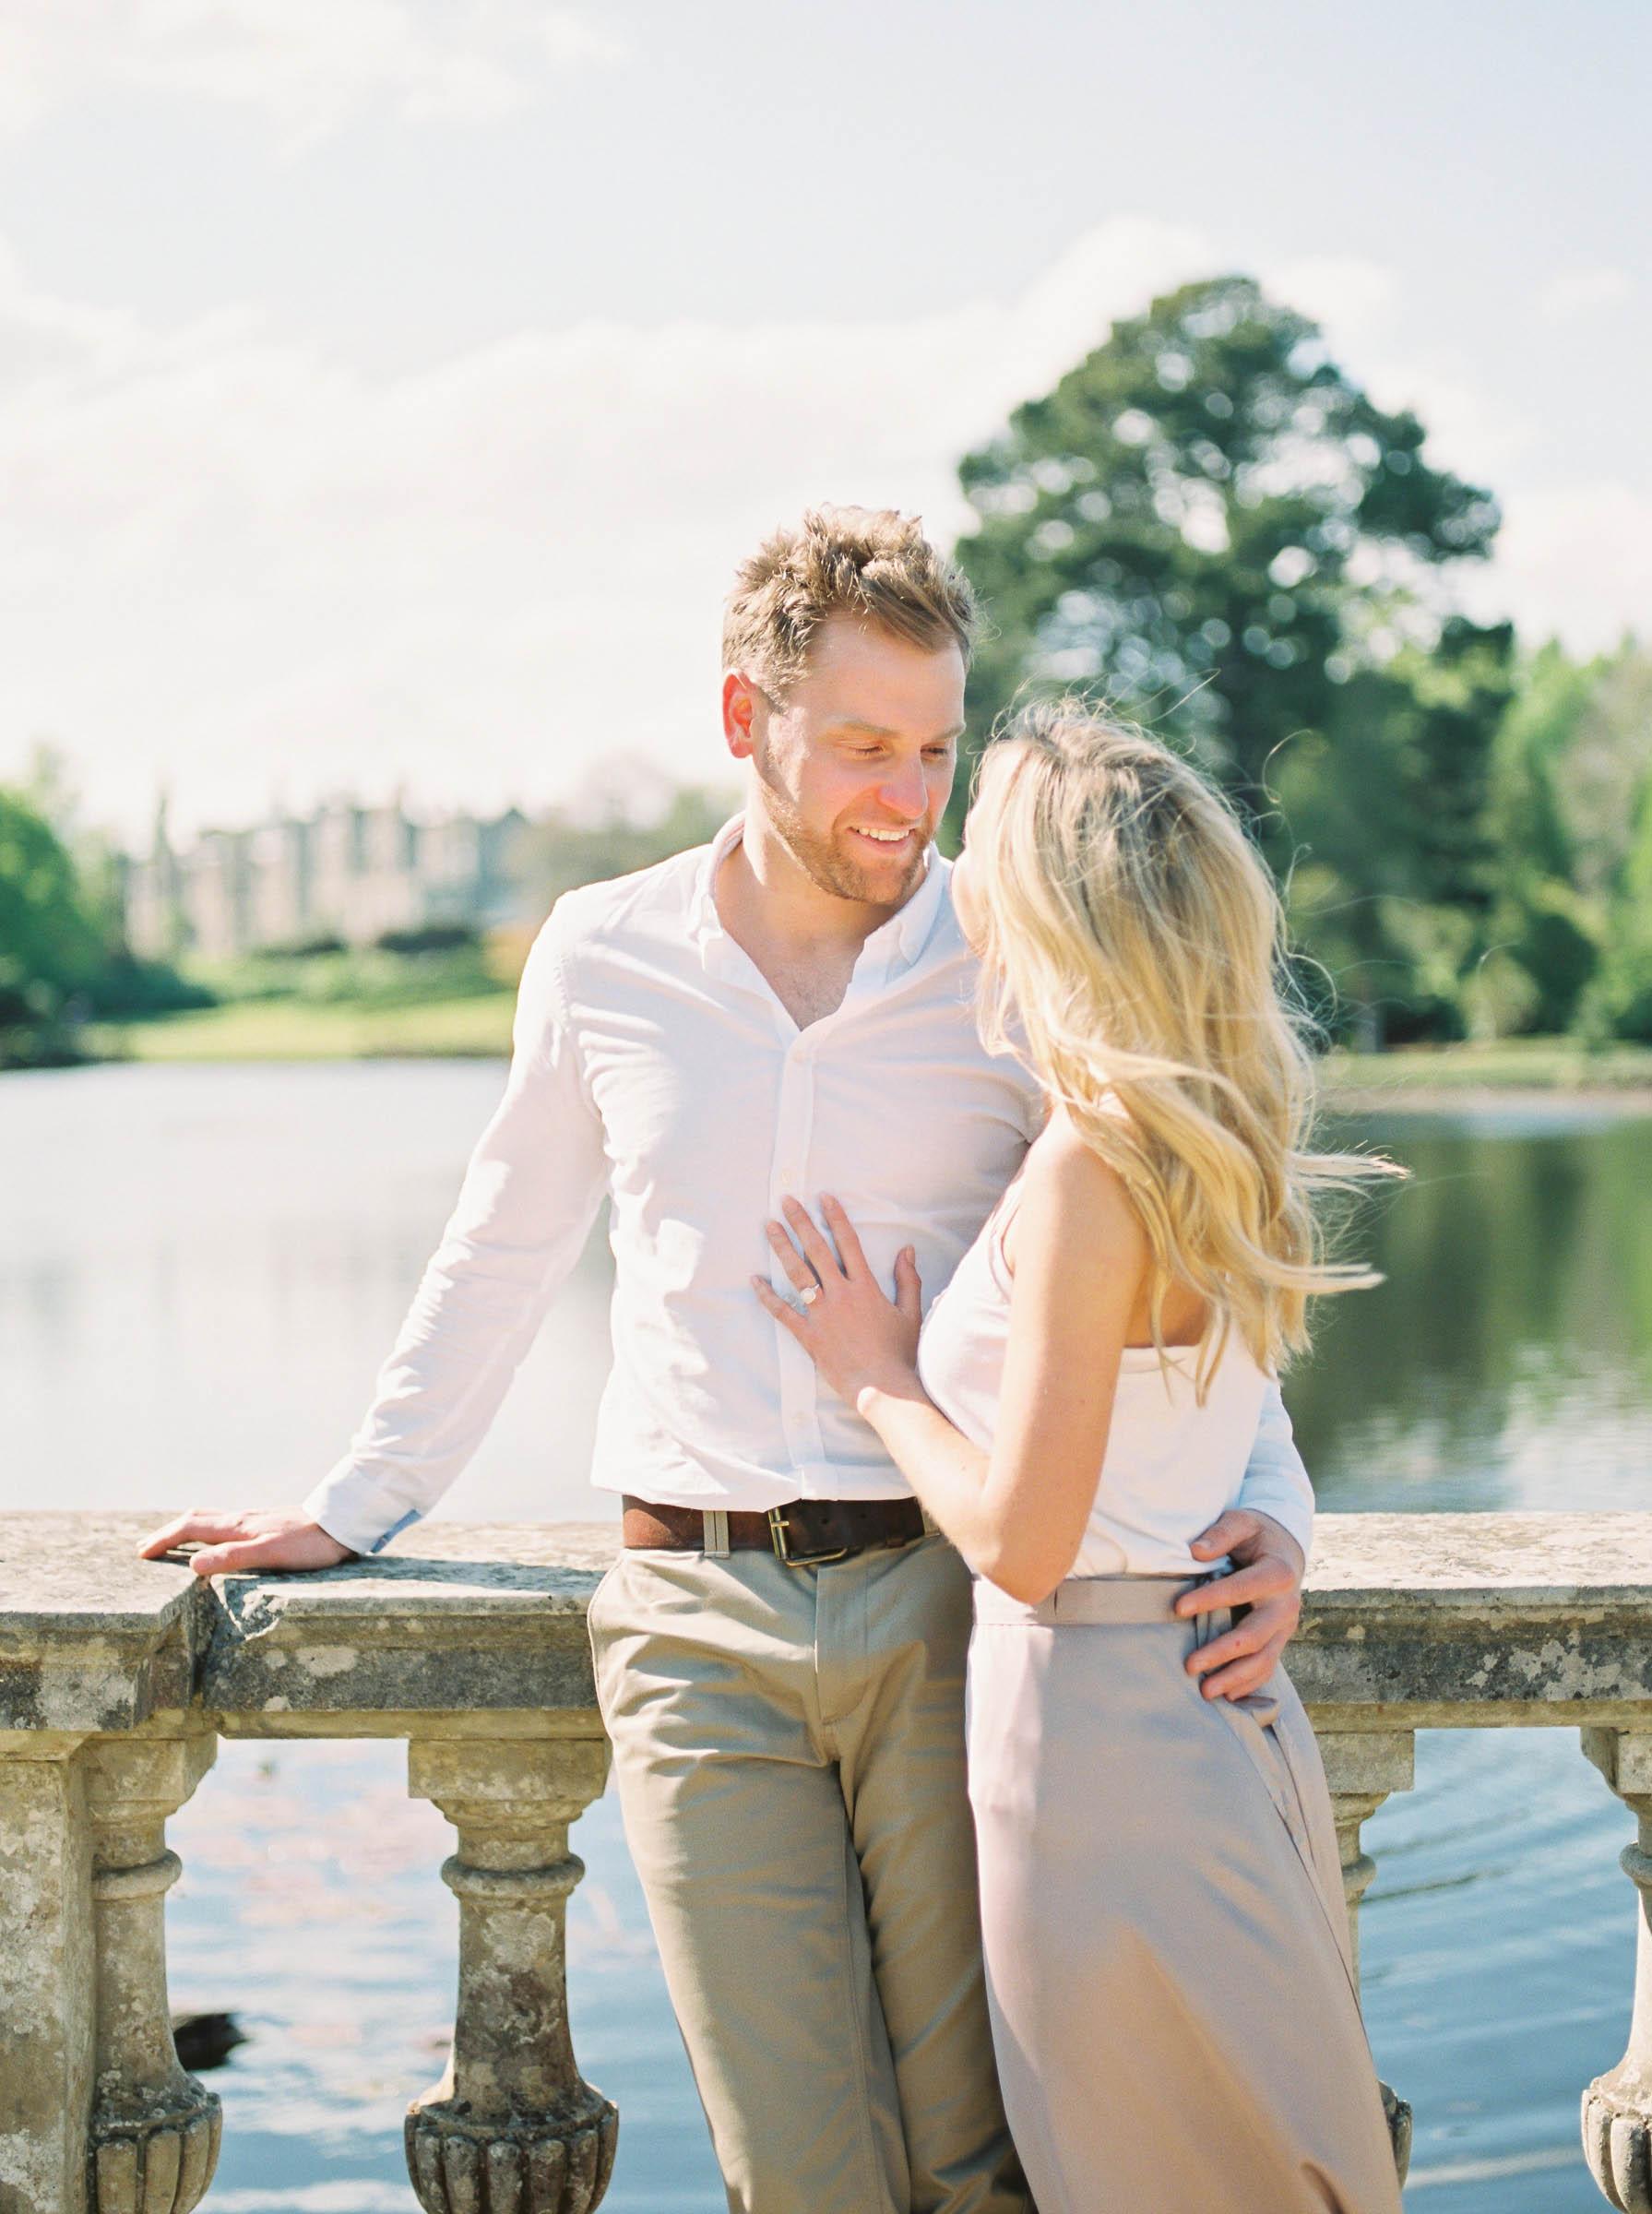 Amy O'Boyle Photography- Destination & UK Fine Art Film Wedding Photographer- Sheffield Park Garden National Trust Spring Engagement Shoot-29.jpg